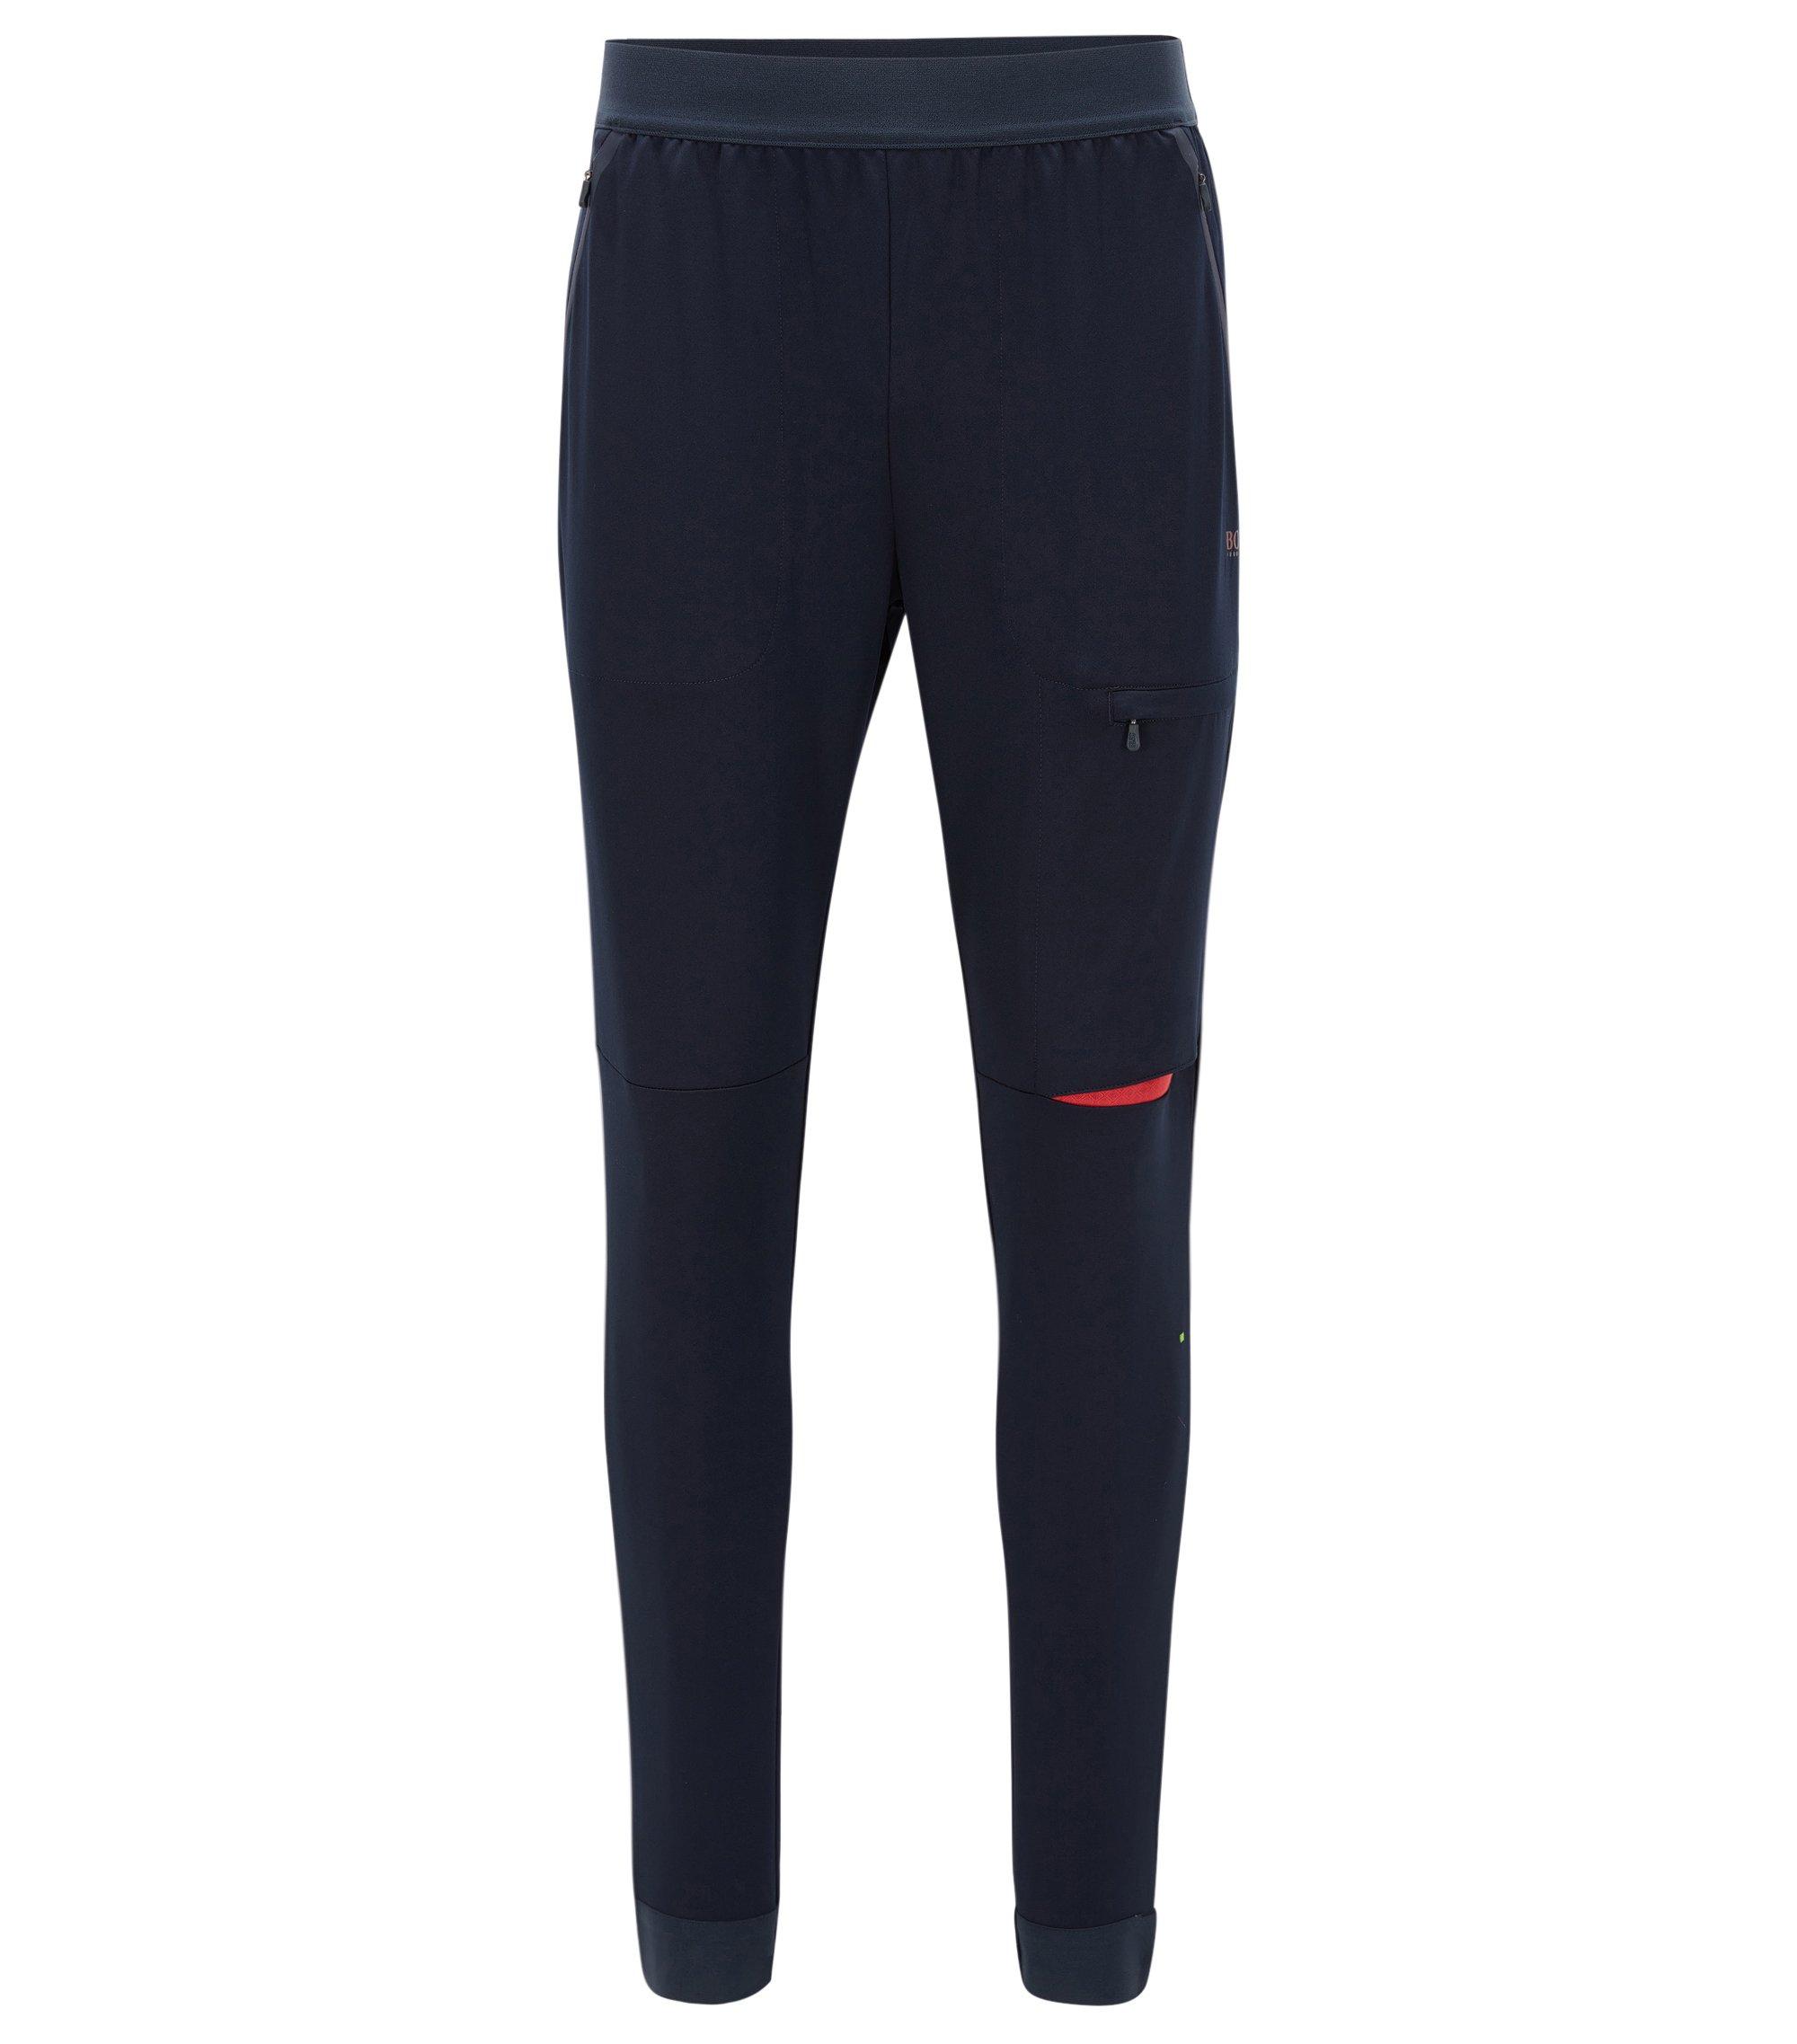 Moisture-Wicking Sweatpant, Slim Fit | Hallutech, Dark Blue